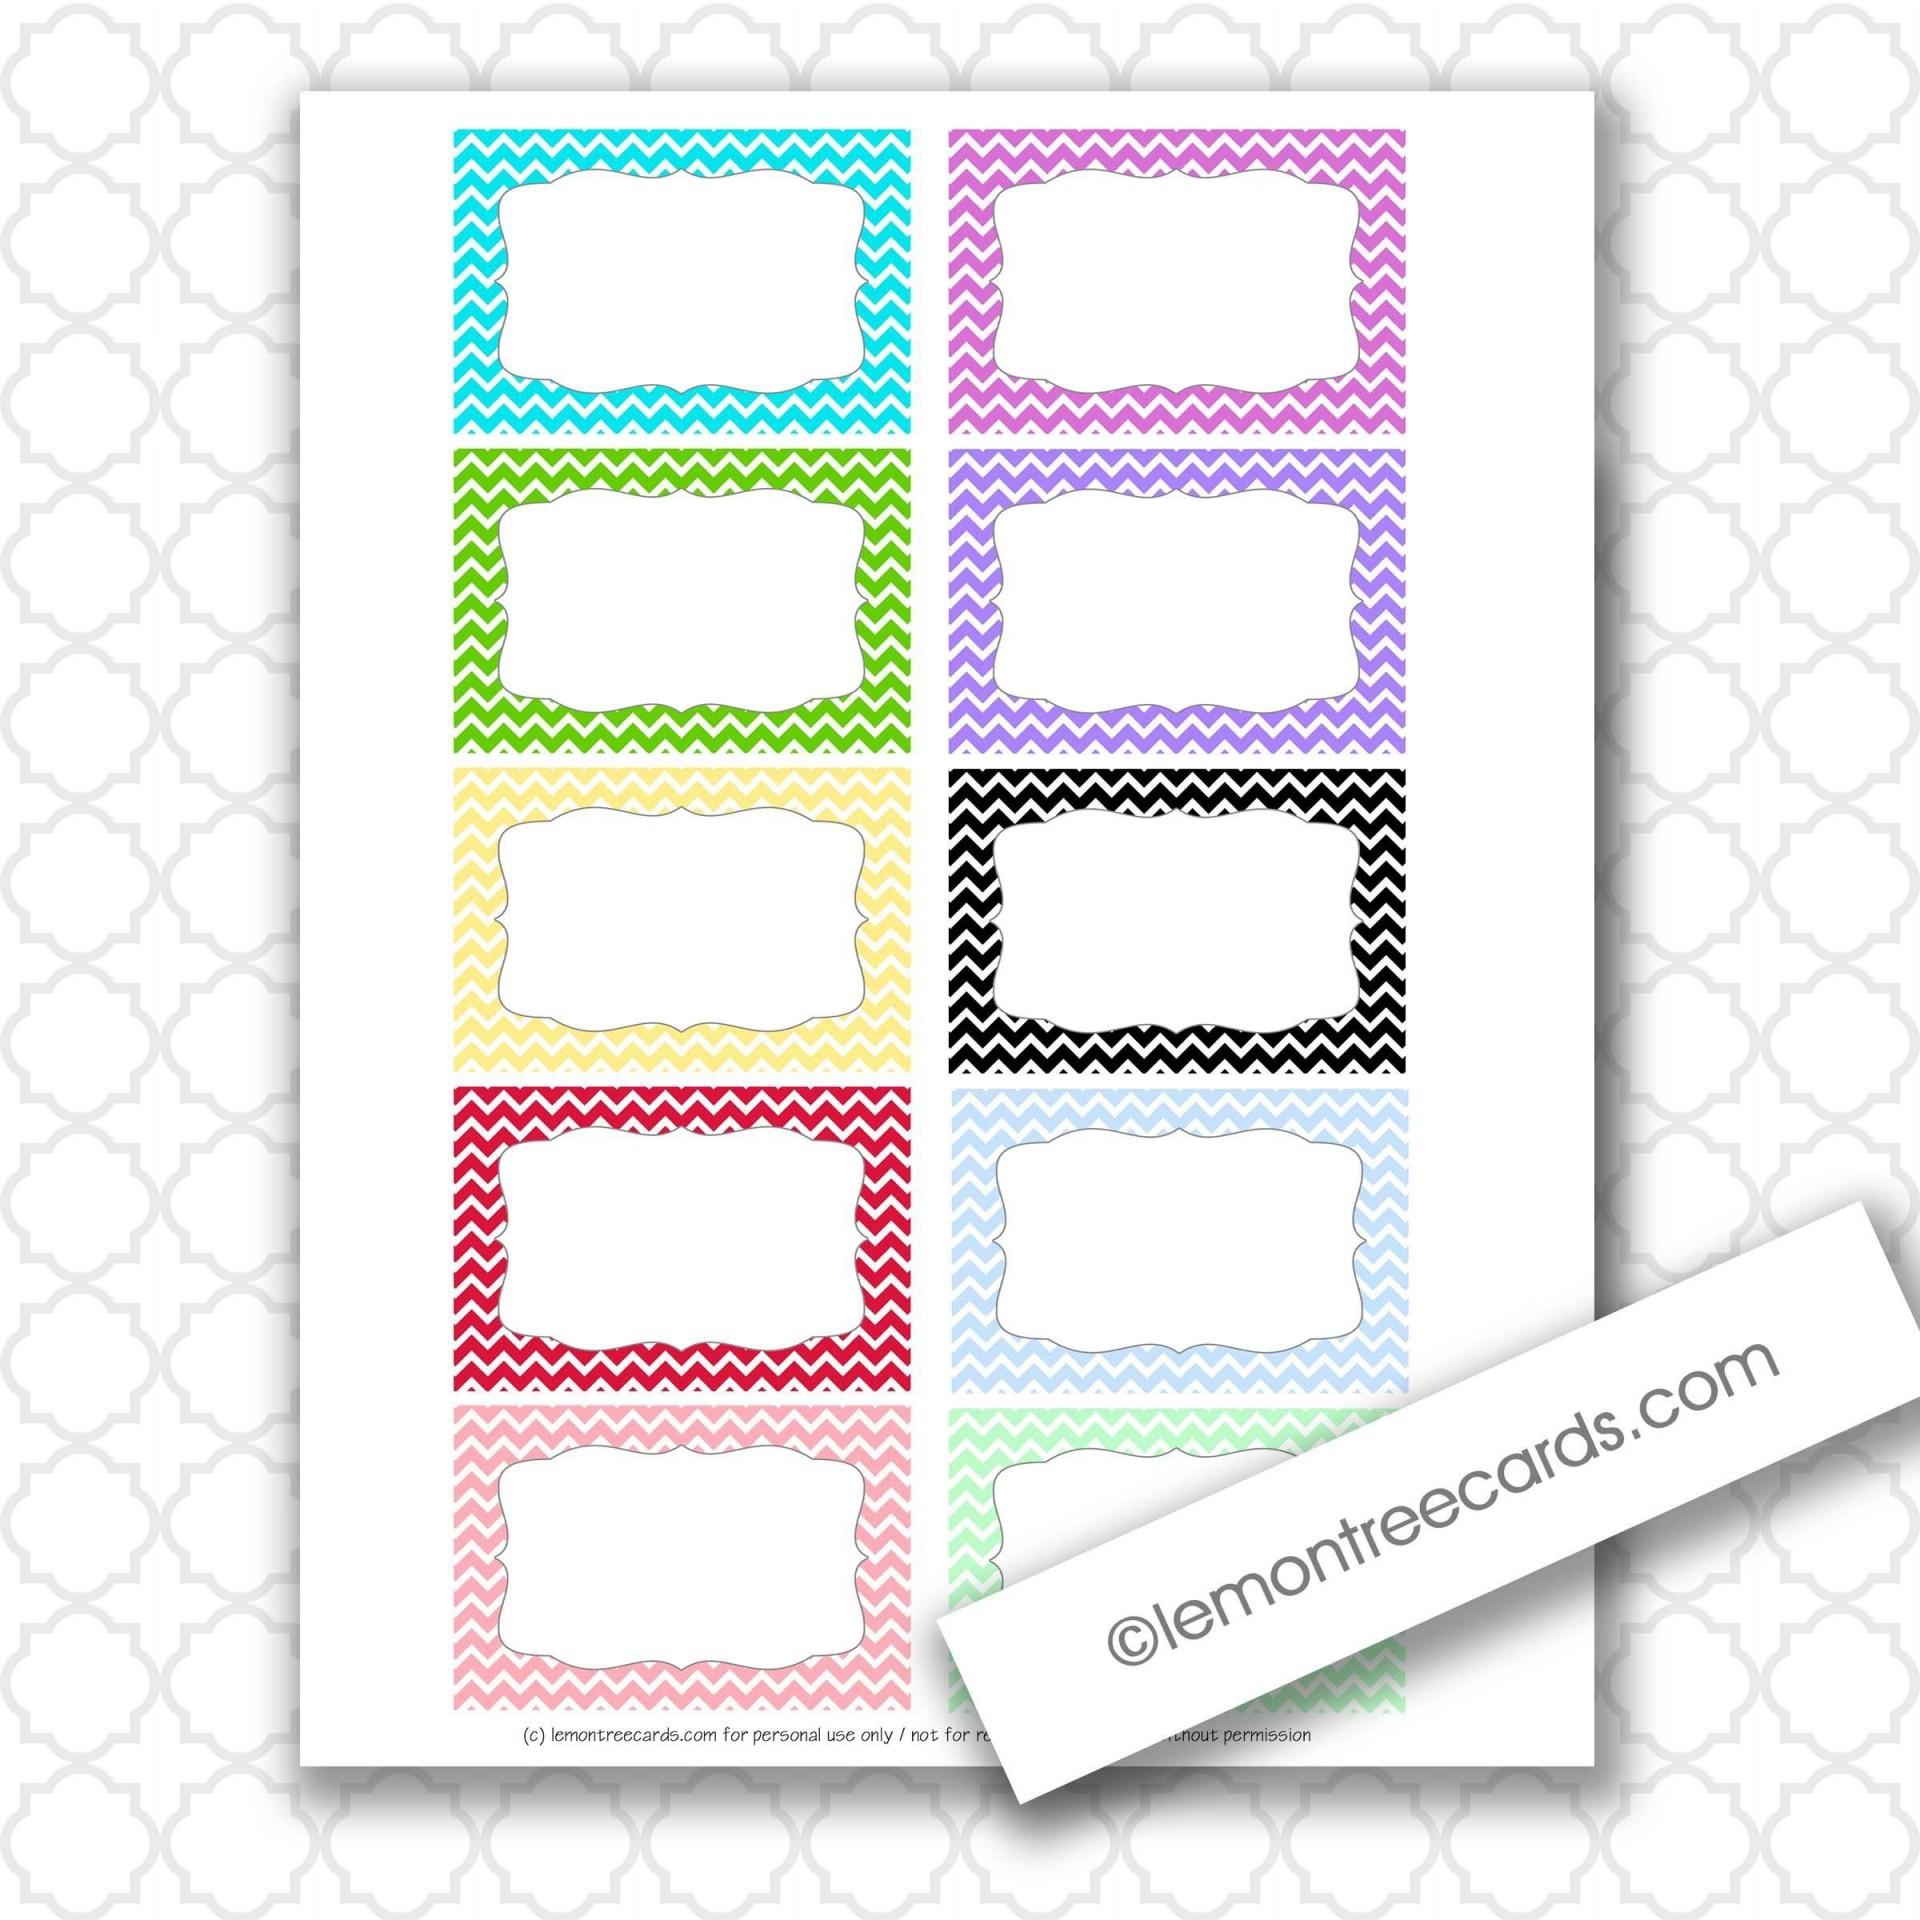 001 Phenomenal Free Index Card Template Idea  Printable Editable1920